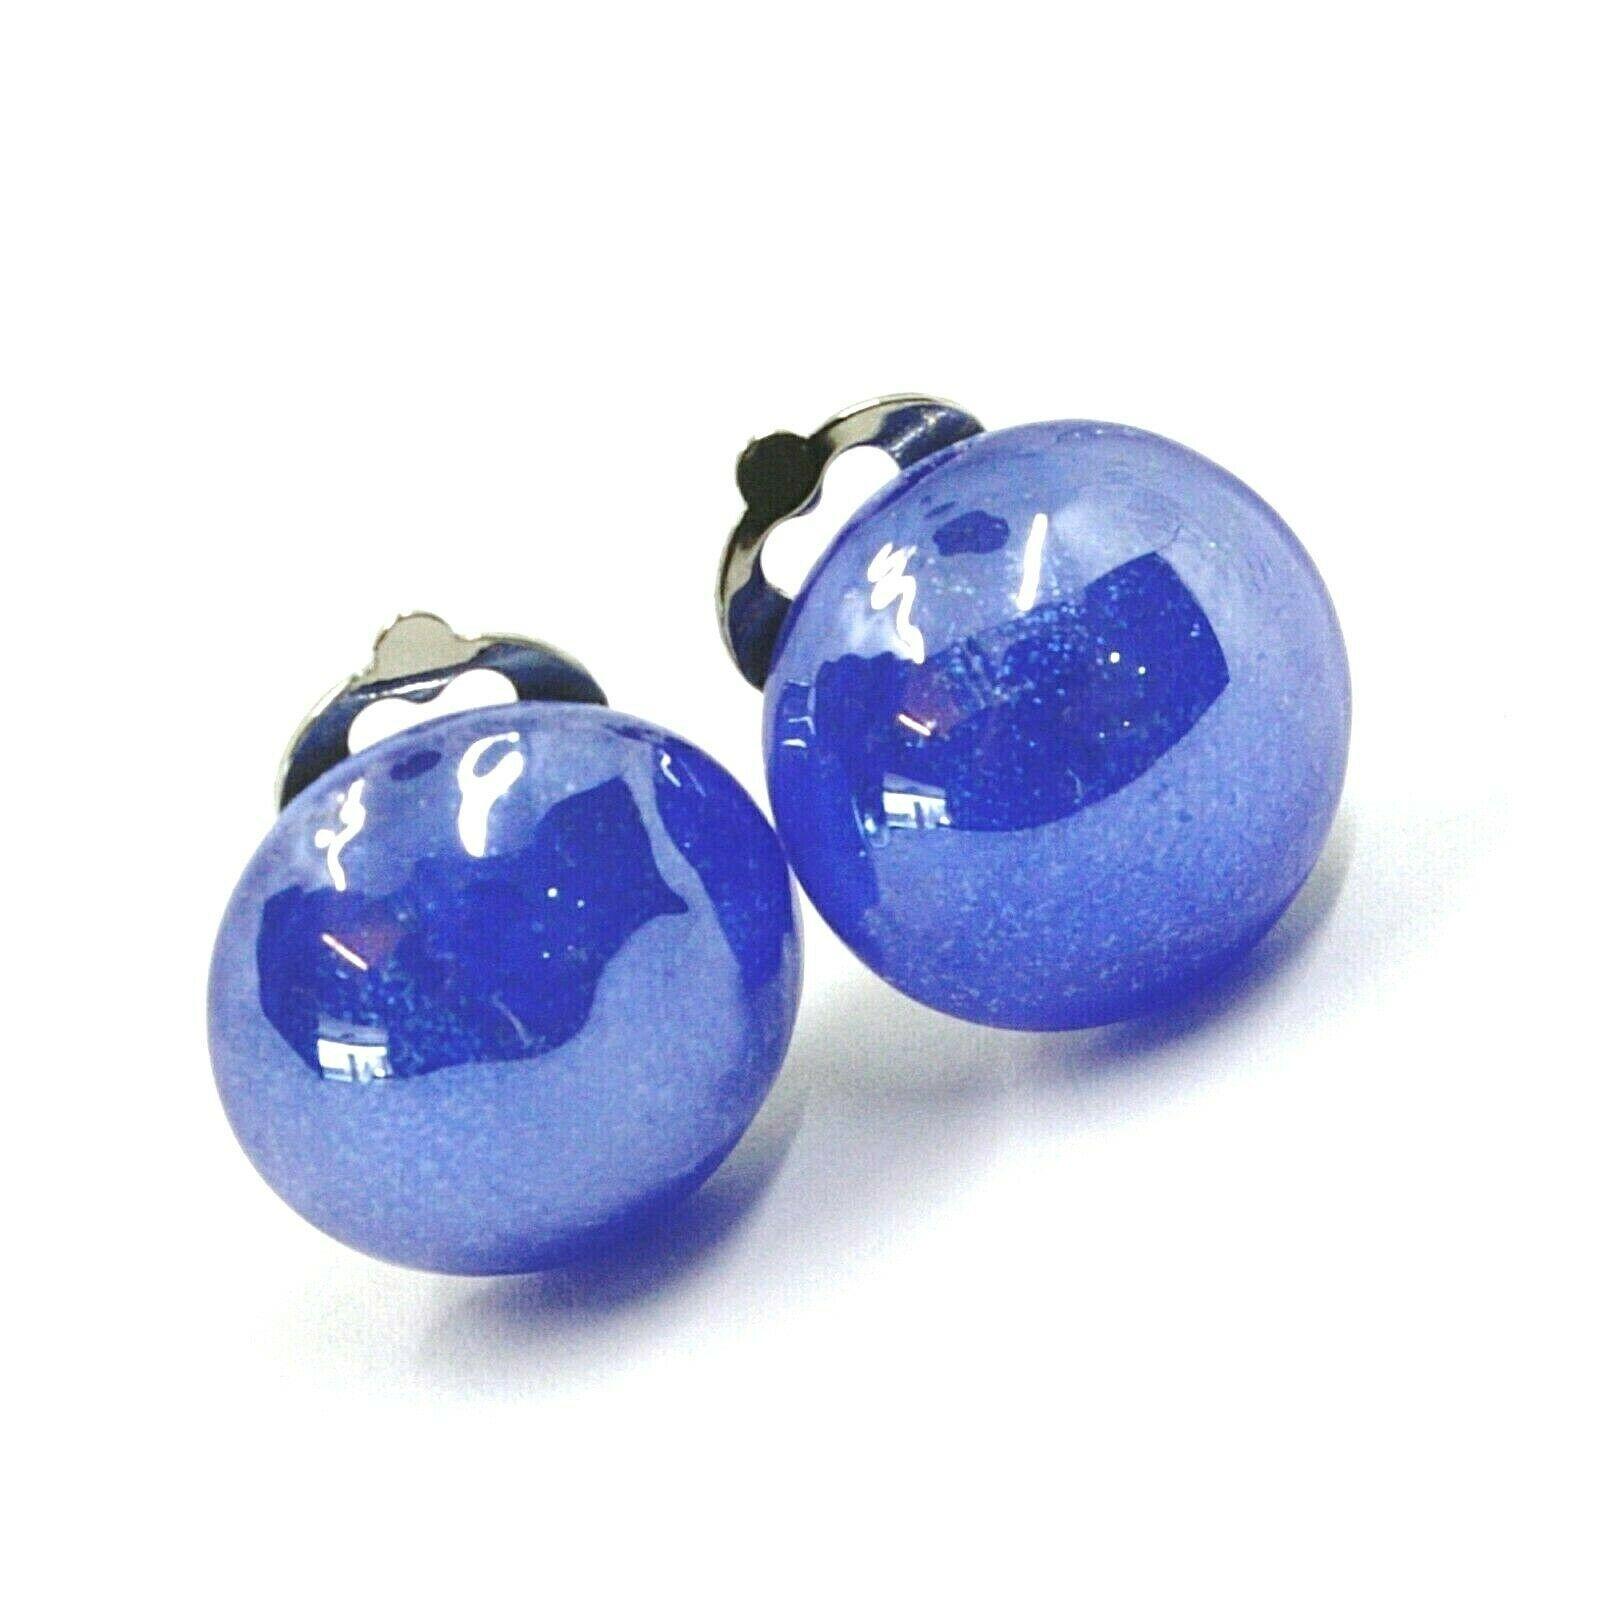 Earrings Antica Murrina Venezia, OR512A06, half Sphere, Blue, Closing Clips